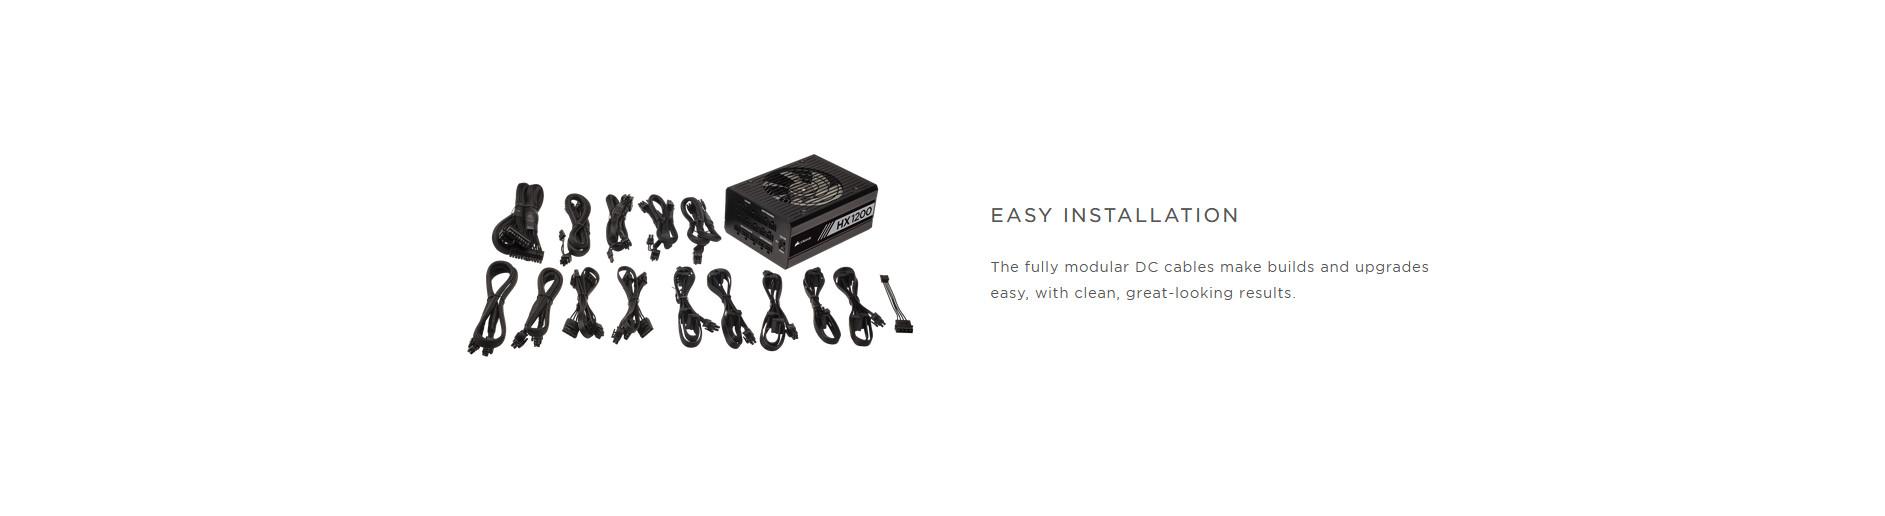 Nguồn Corsair HX1200 1200W (80 Platinum/Màu Đen/Full Modul) giới thiệu 5